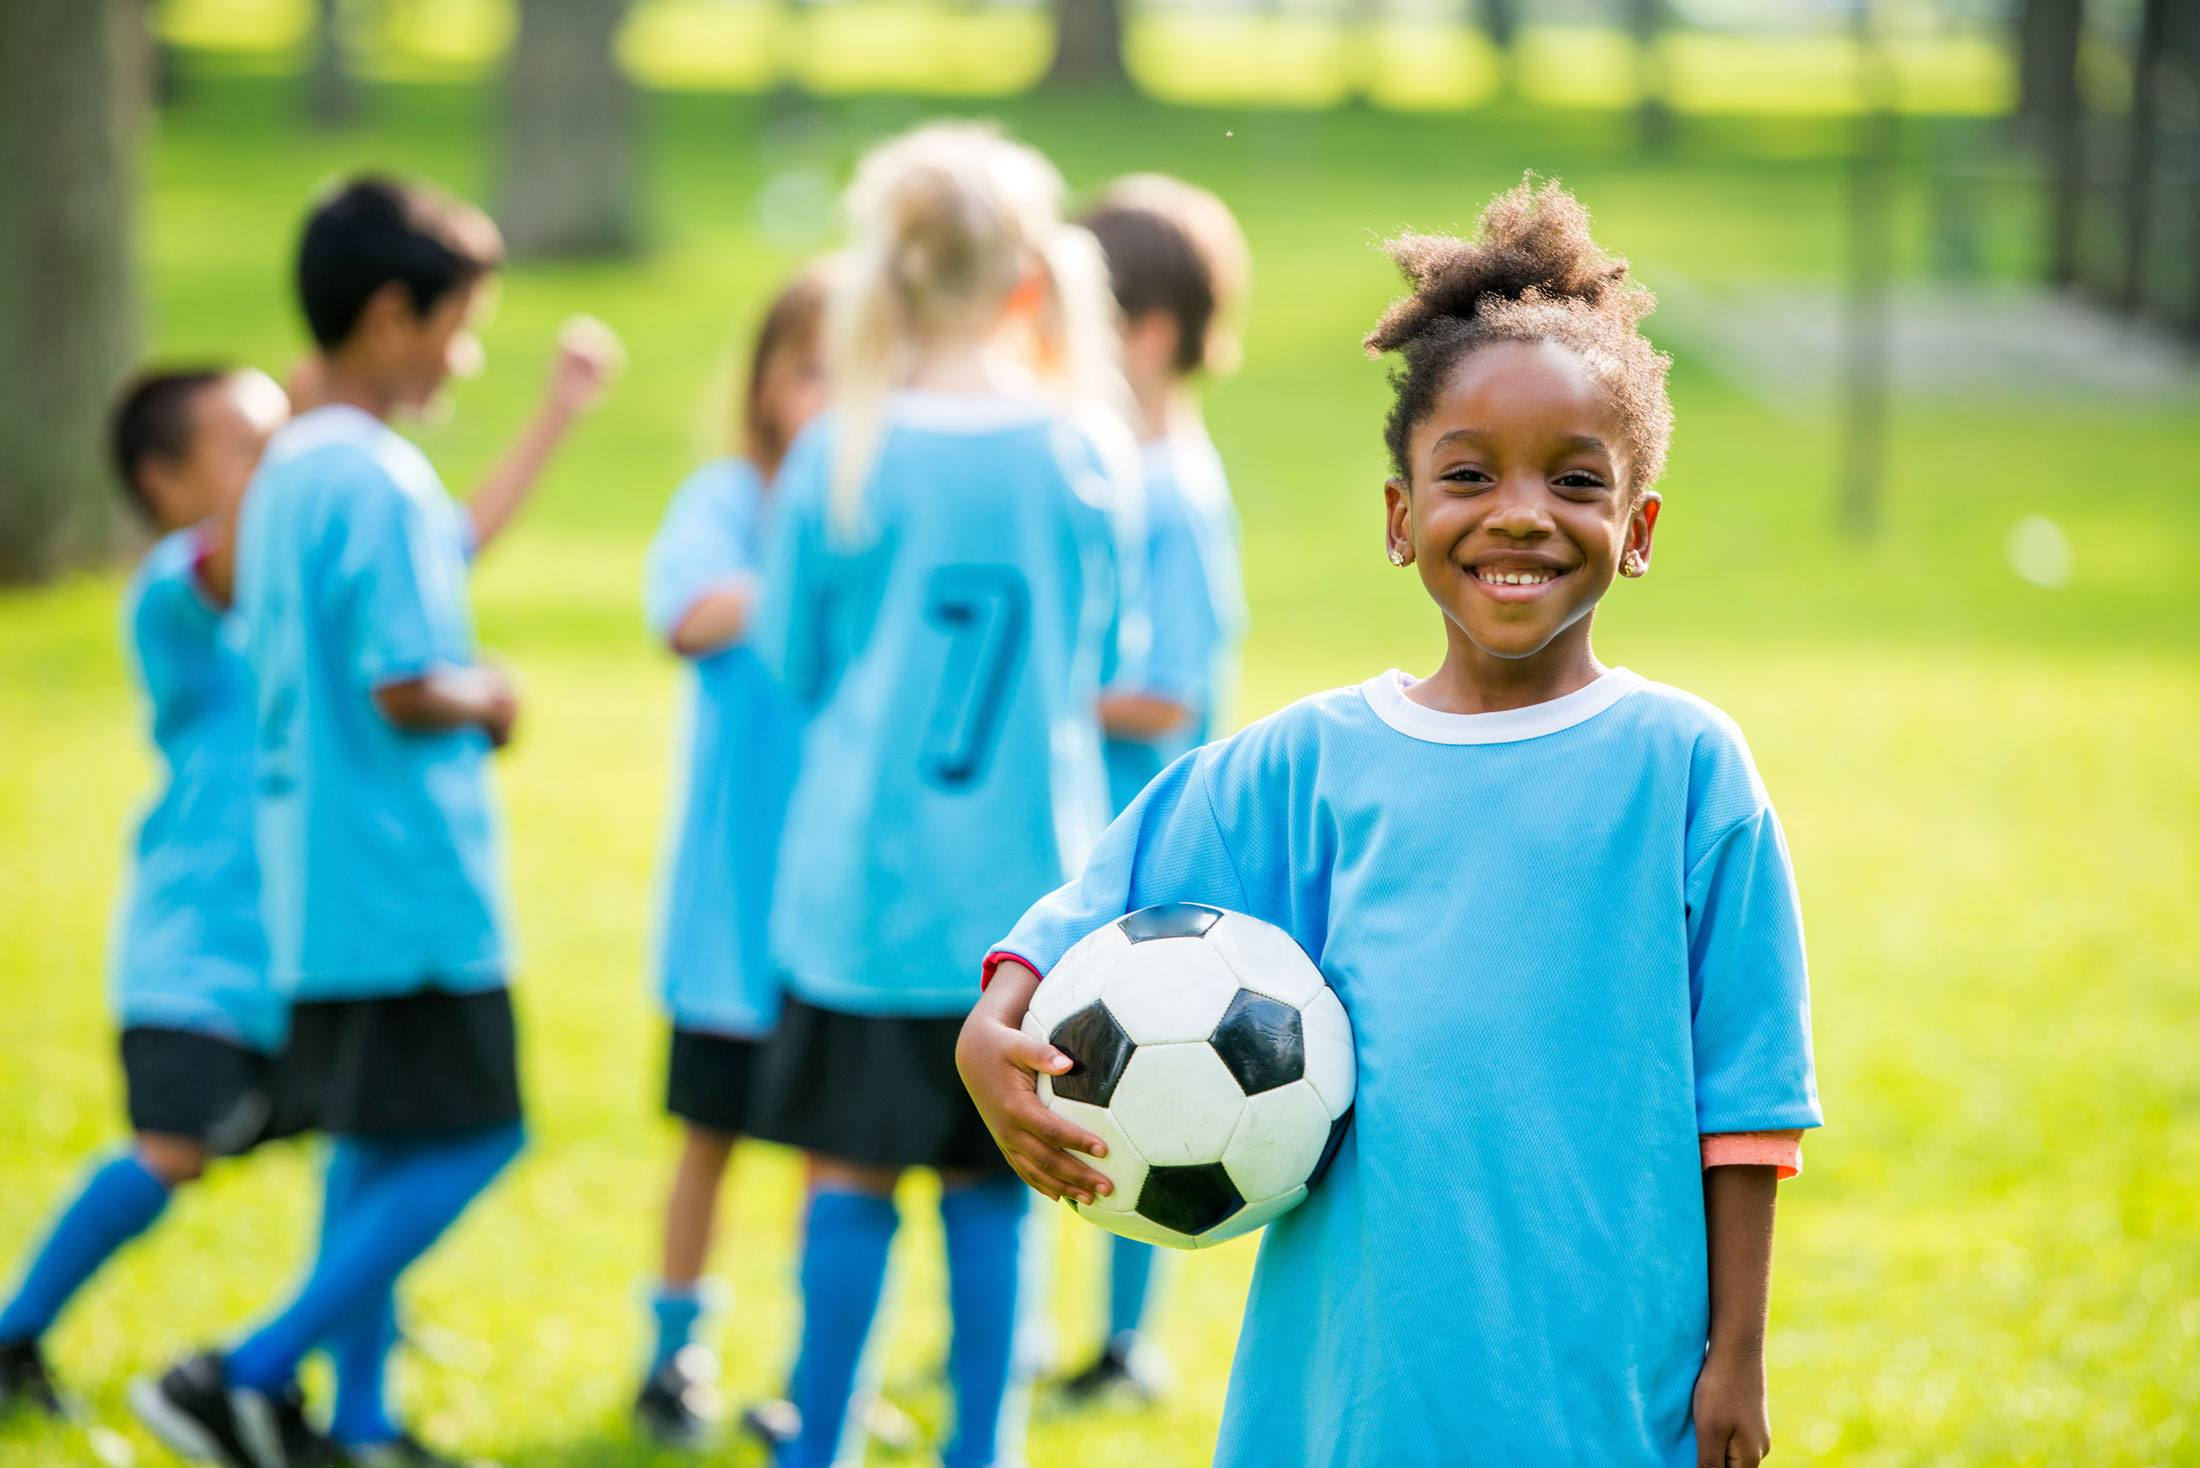 Preventing Sports Injuries in Kids Preventing Sports Injuries in Kids new pictures